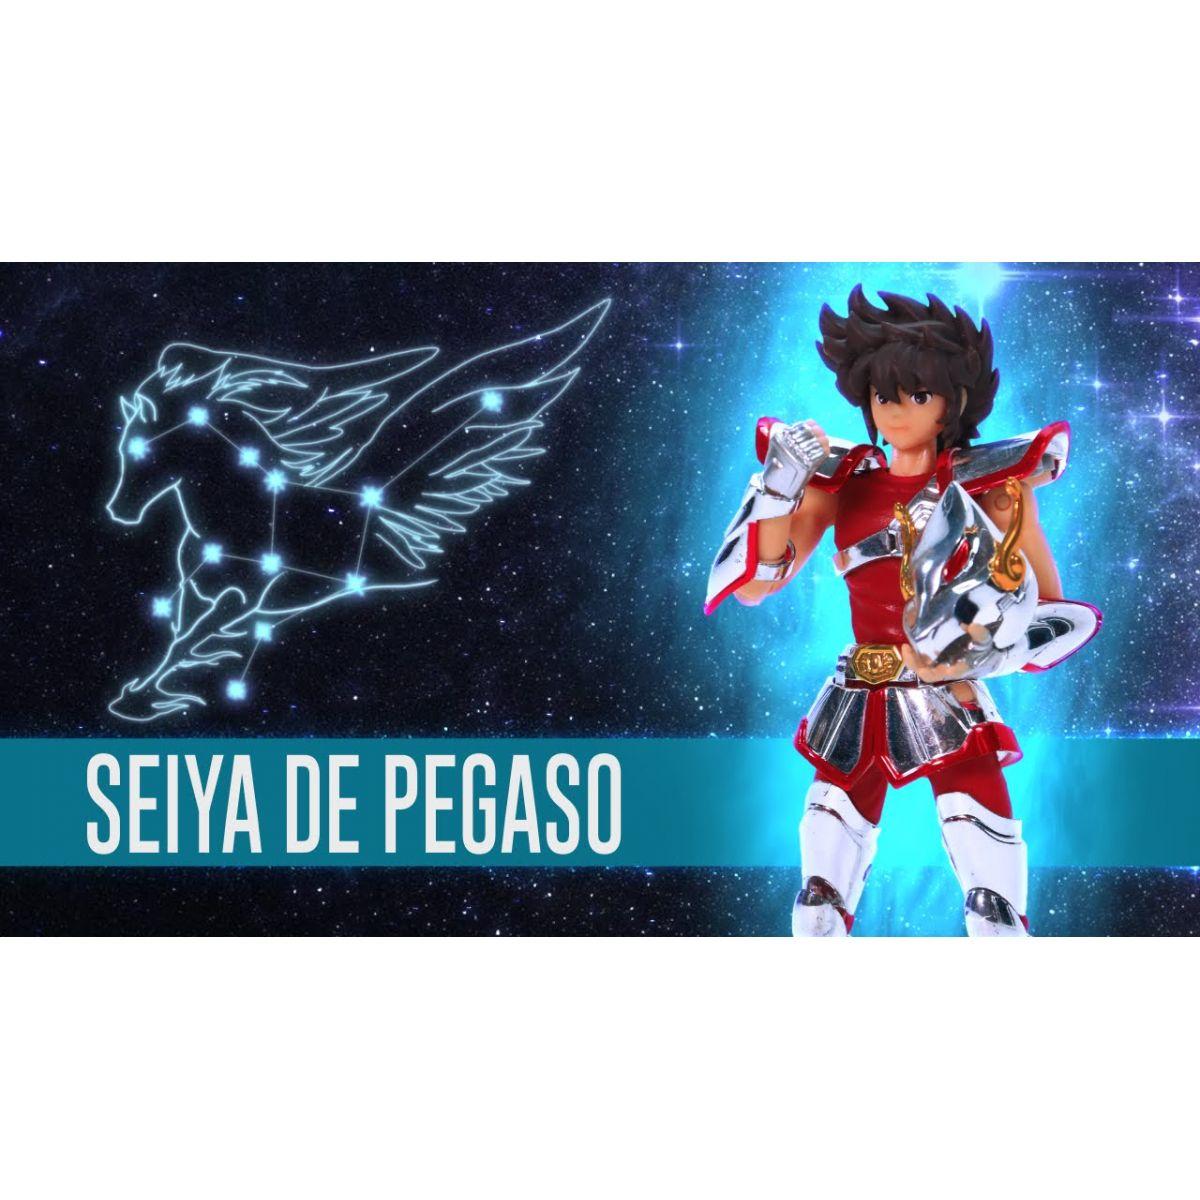 (Os Cavaleiros do Zodíaco) Saint Seiya Pegasus Seiya DD Panoramation - Bandai  - Toyshow Colecionáveis